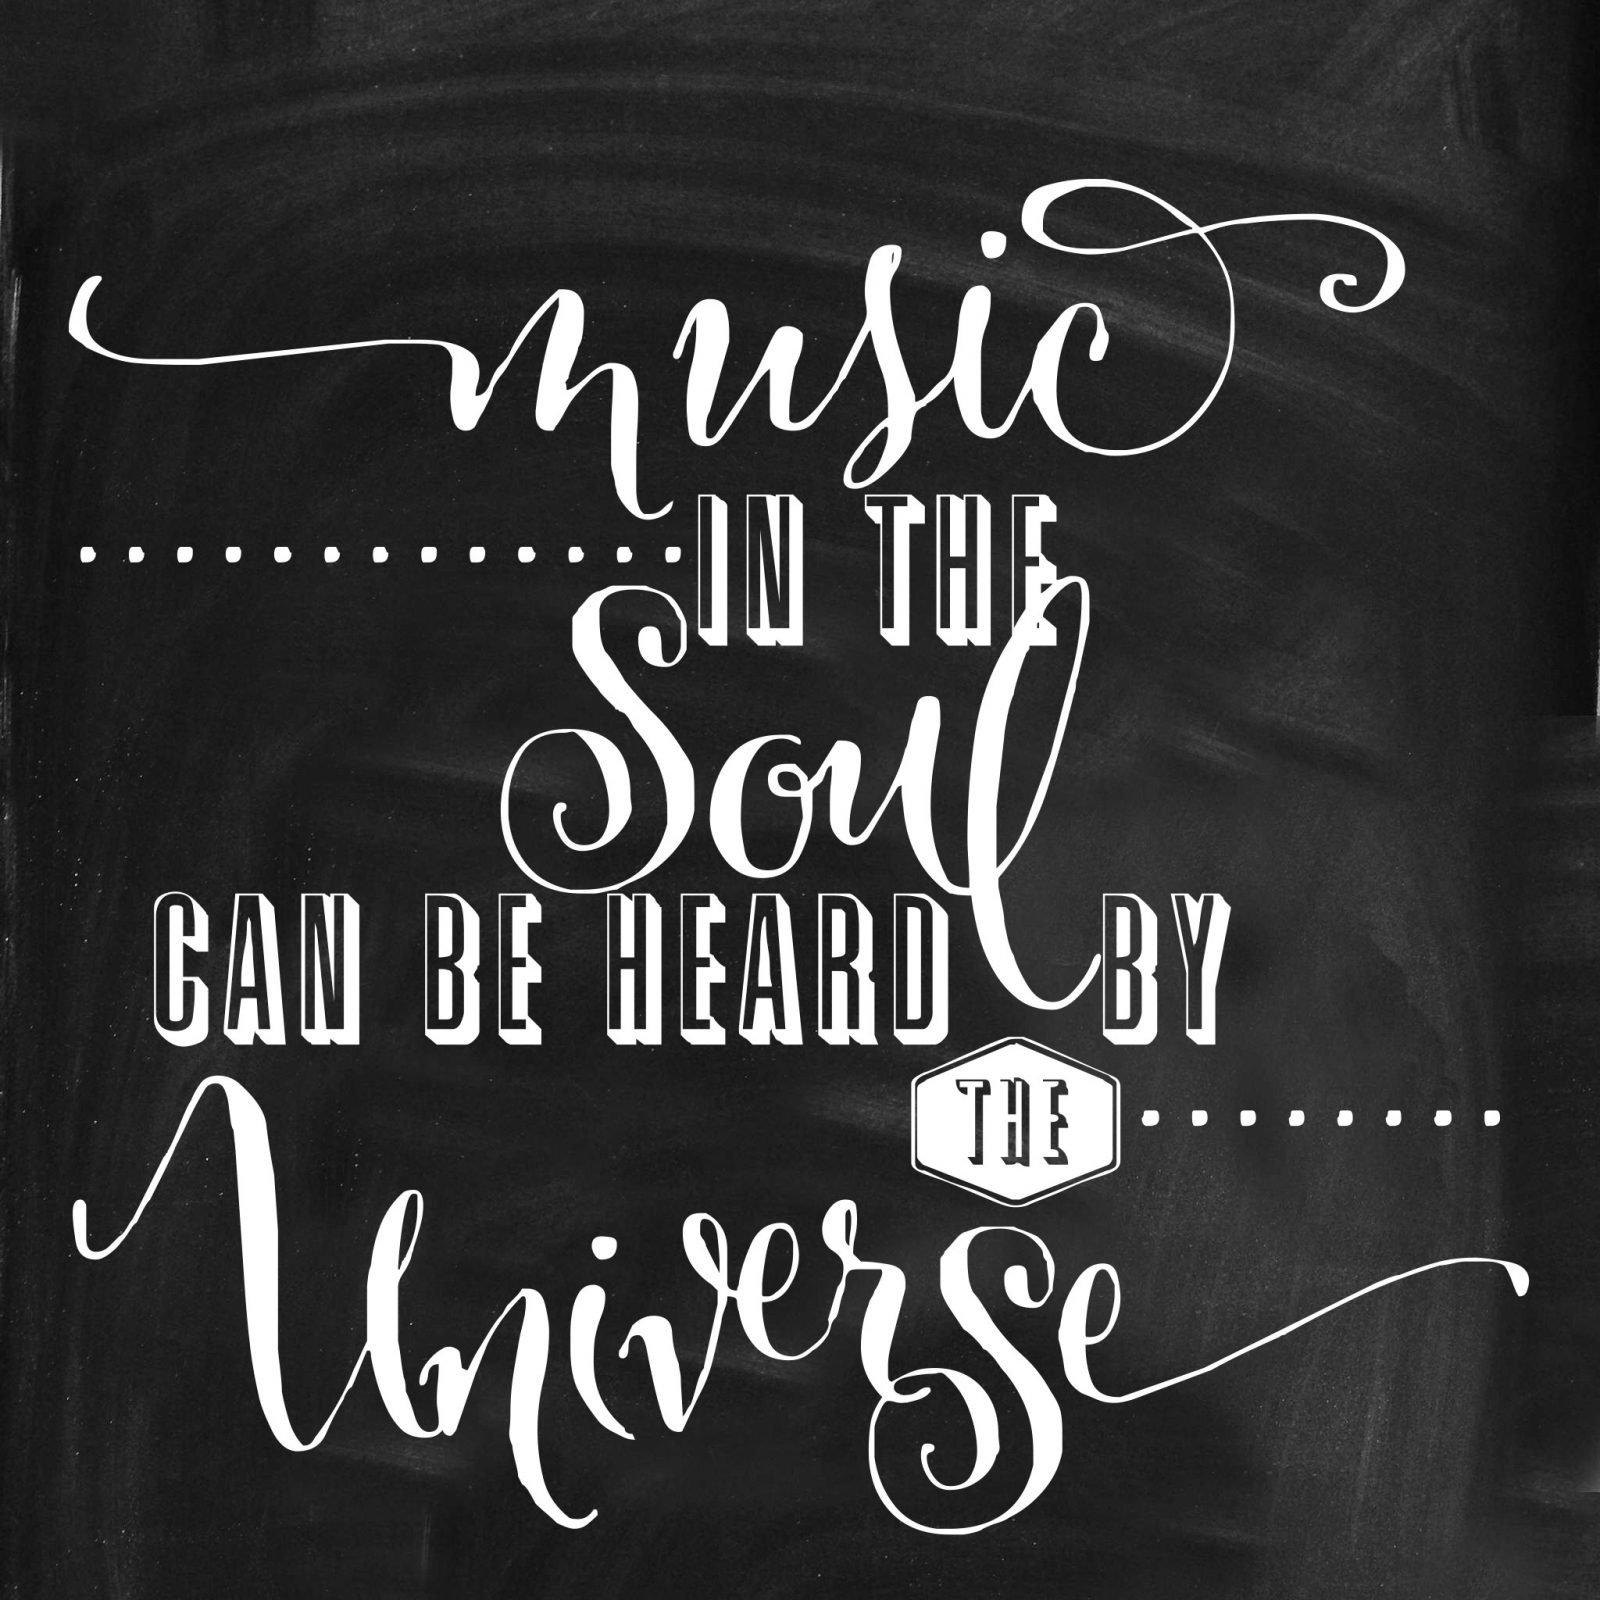 MusicintheSoul